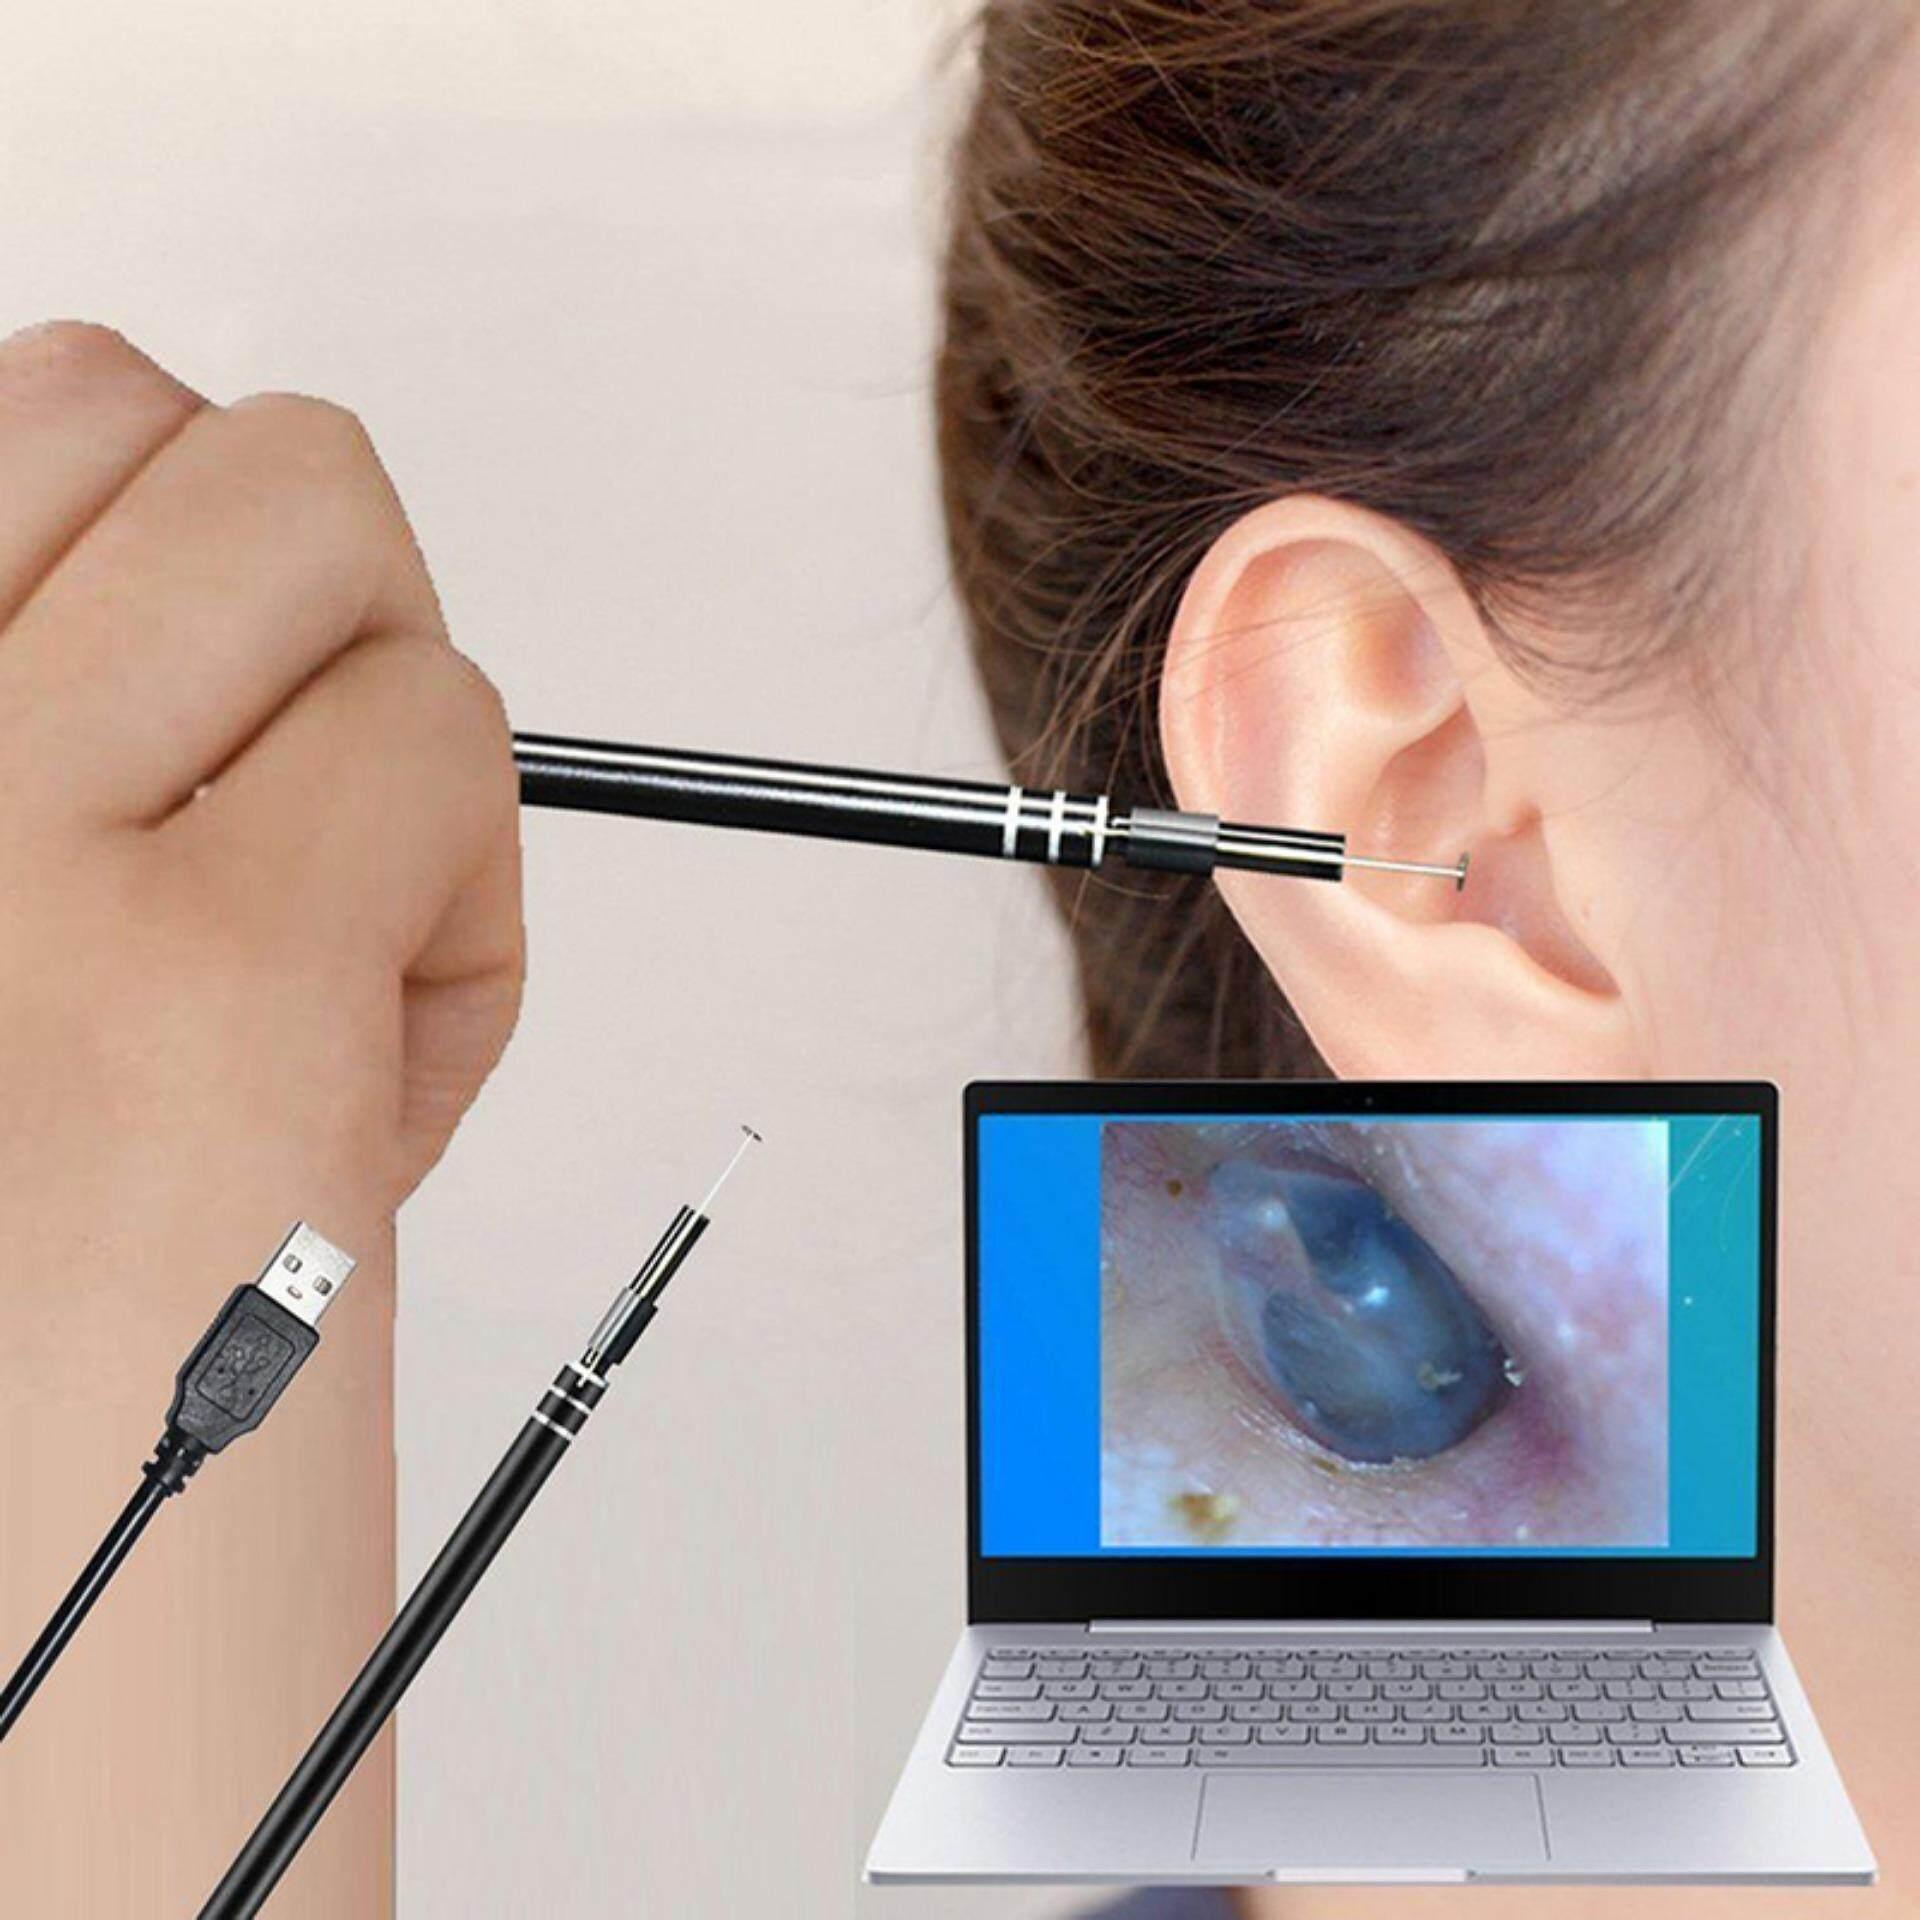 Usb Ear Cleaning Endoscope Hd Visual Ear Spoon Earpick With Mini Camera Qc